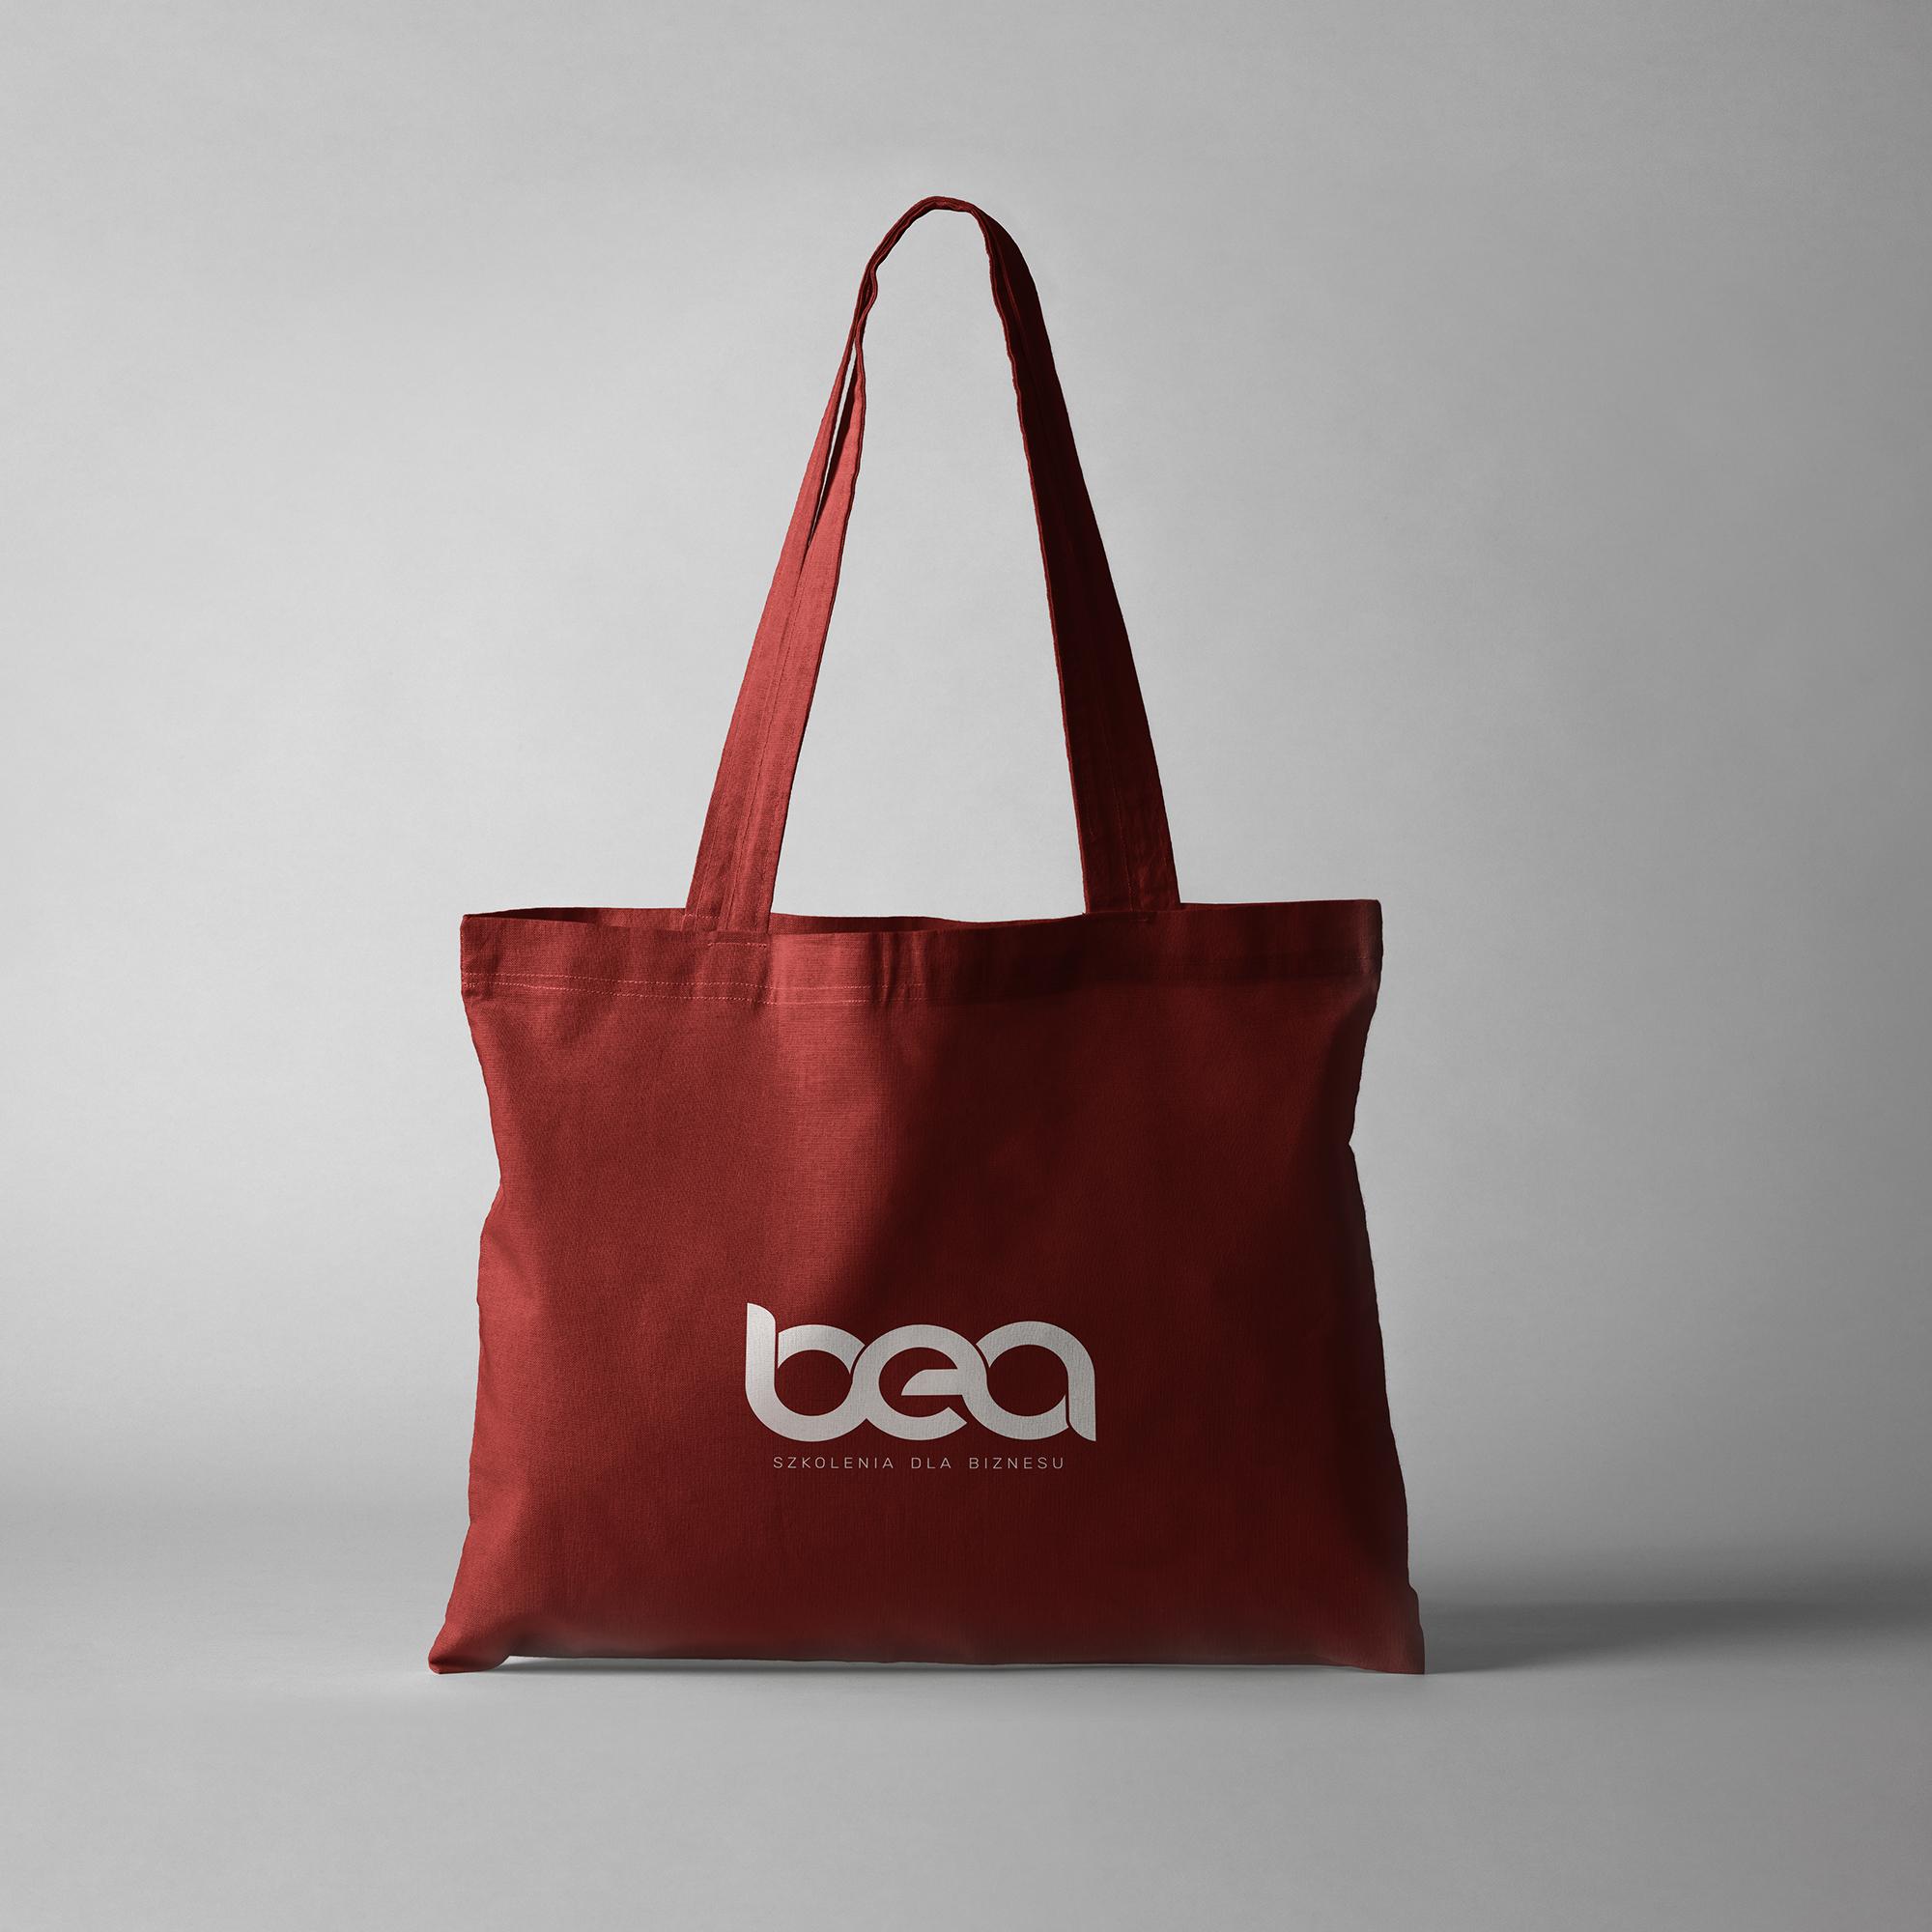 torba materiałowa bea